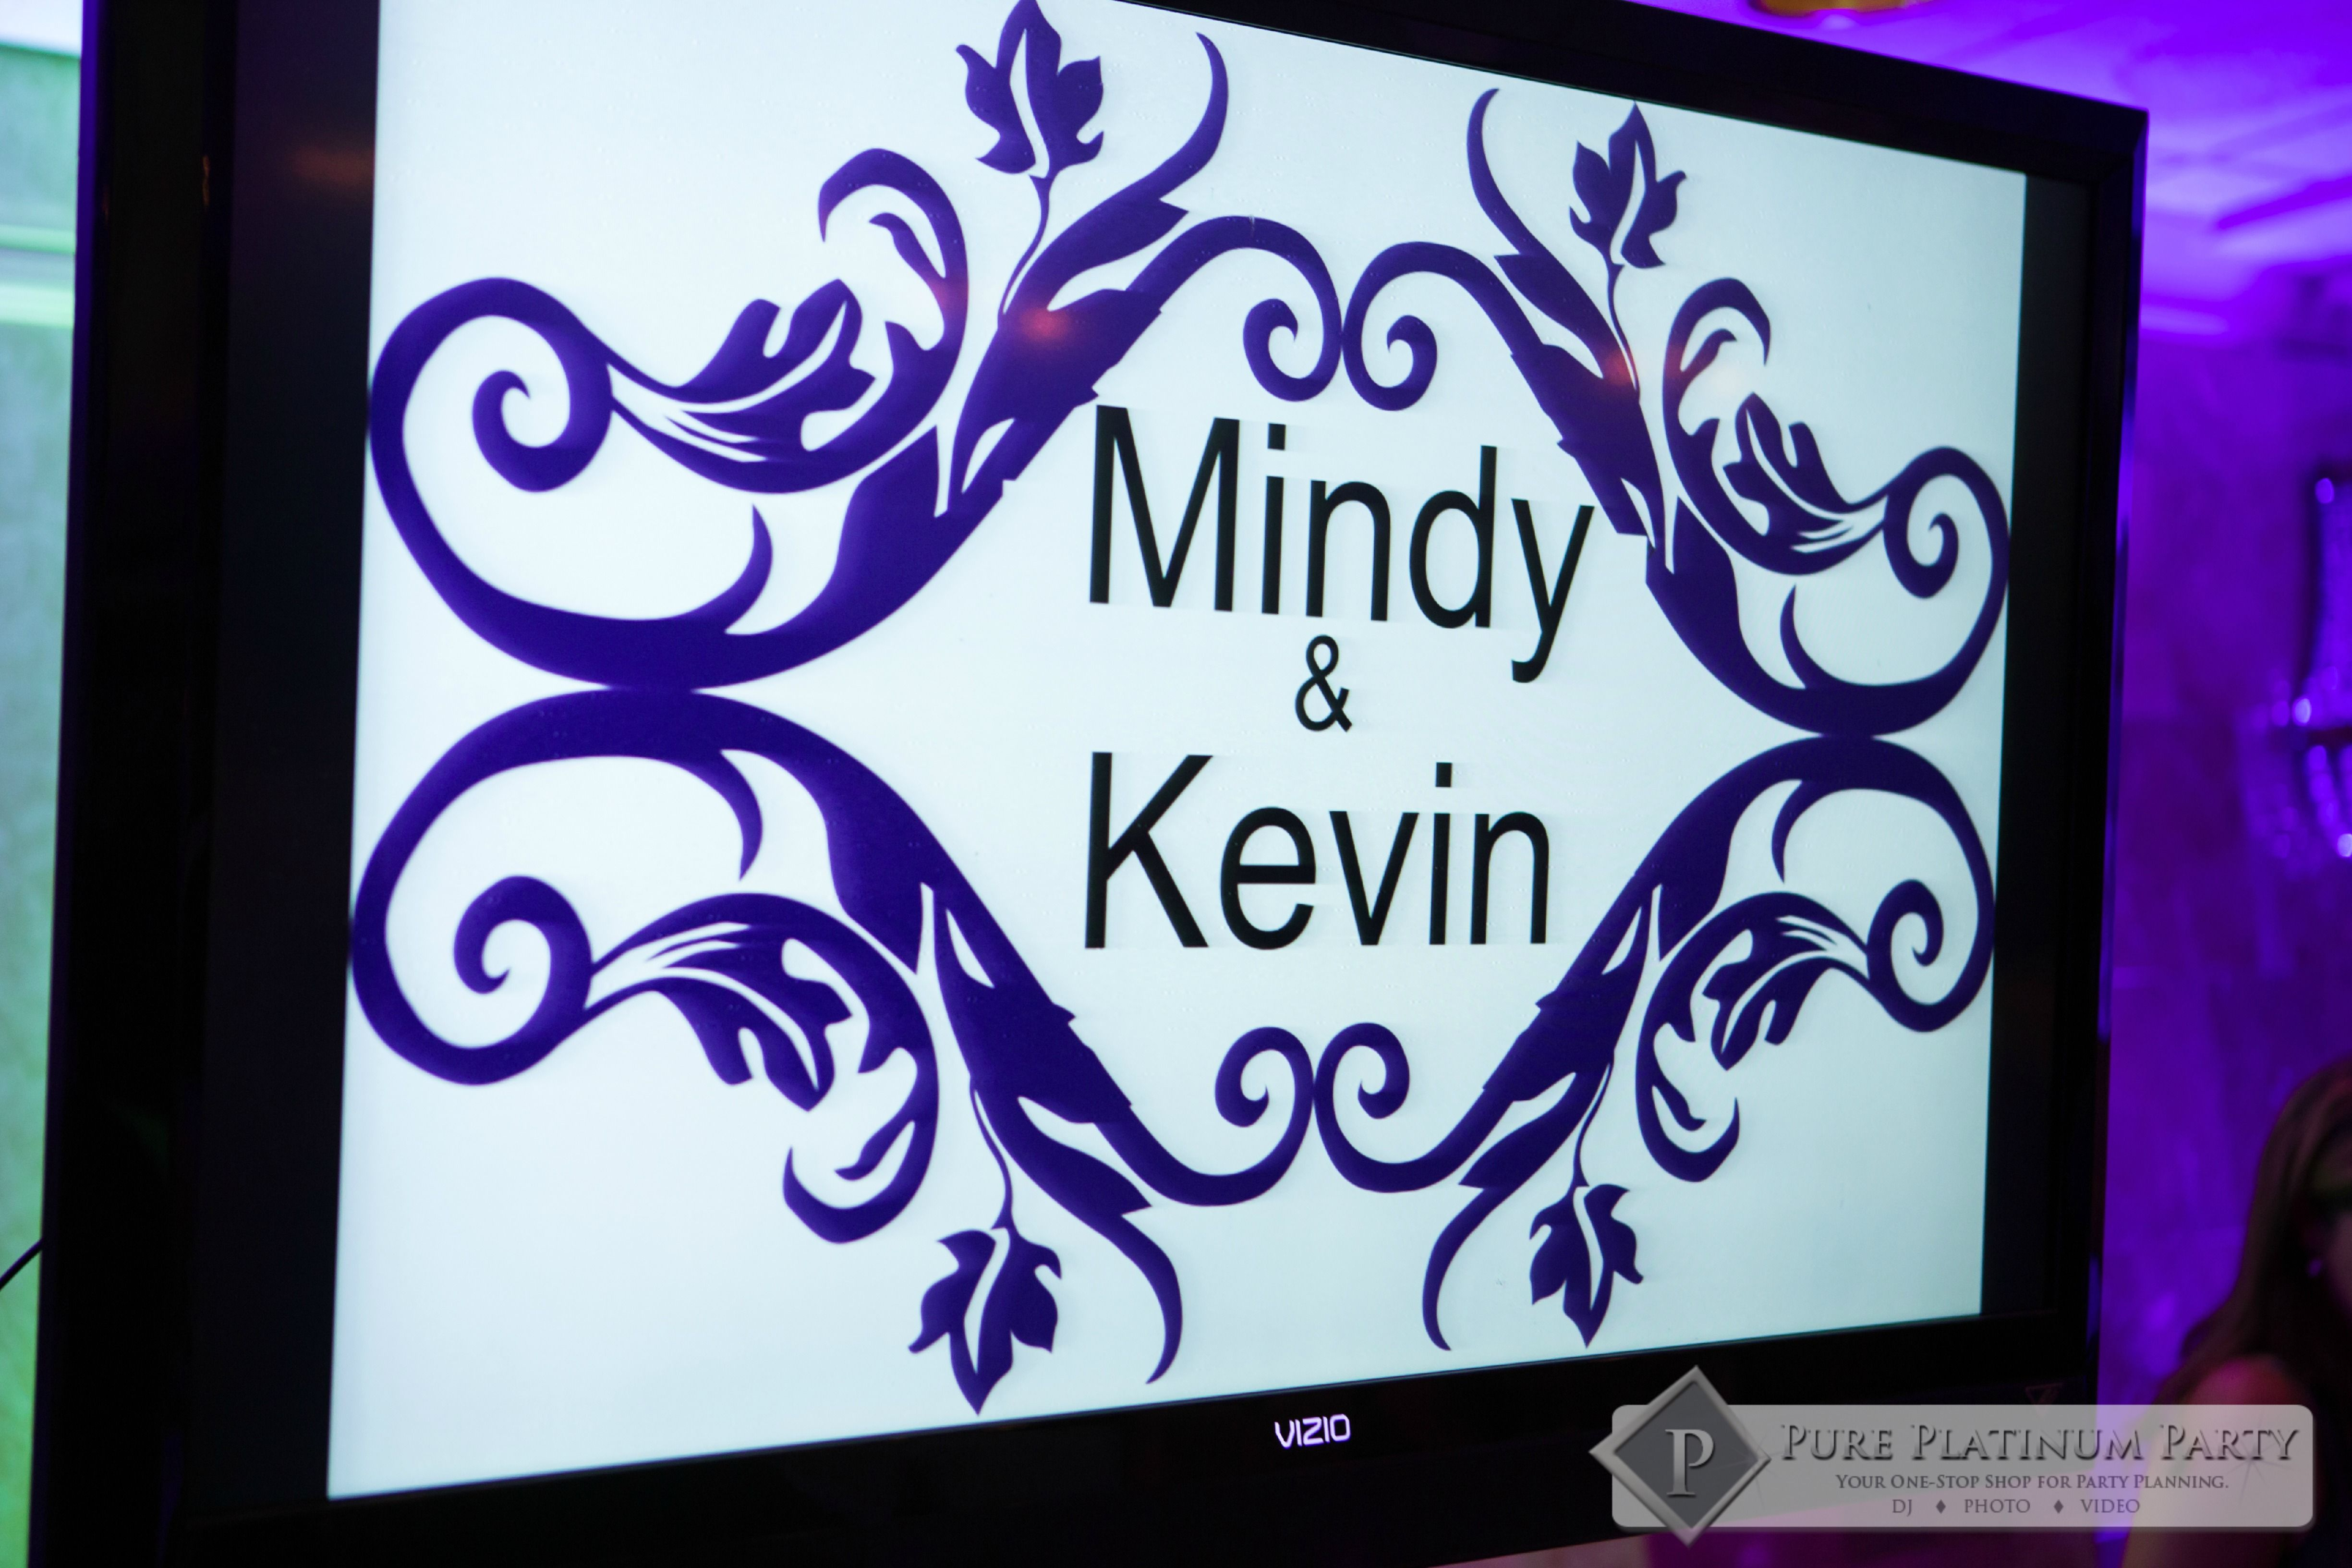 Mindy & Kevin #weddingdj #weddingentertainment #weddings #uplighting #pureplatinumparty #photobooths #WeddingEntertainment